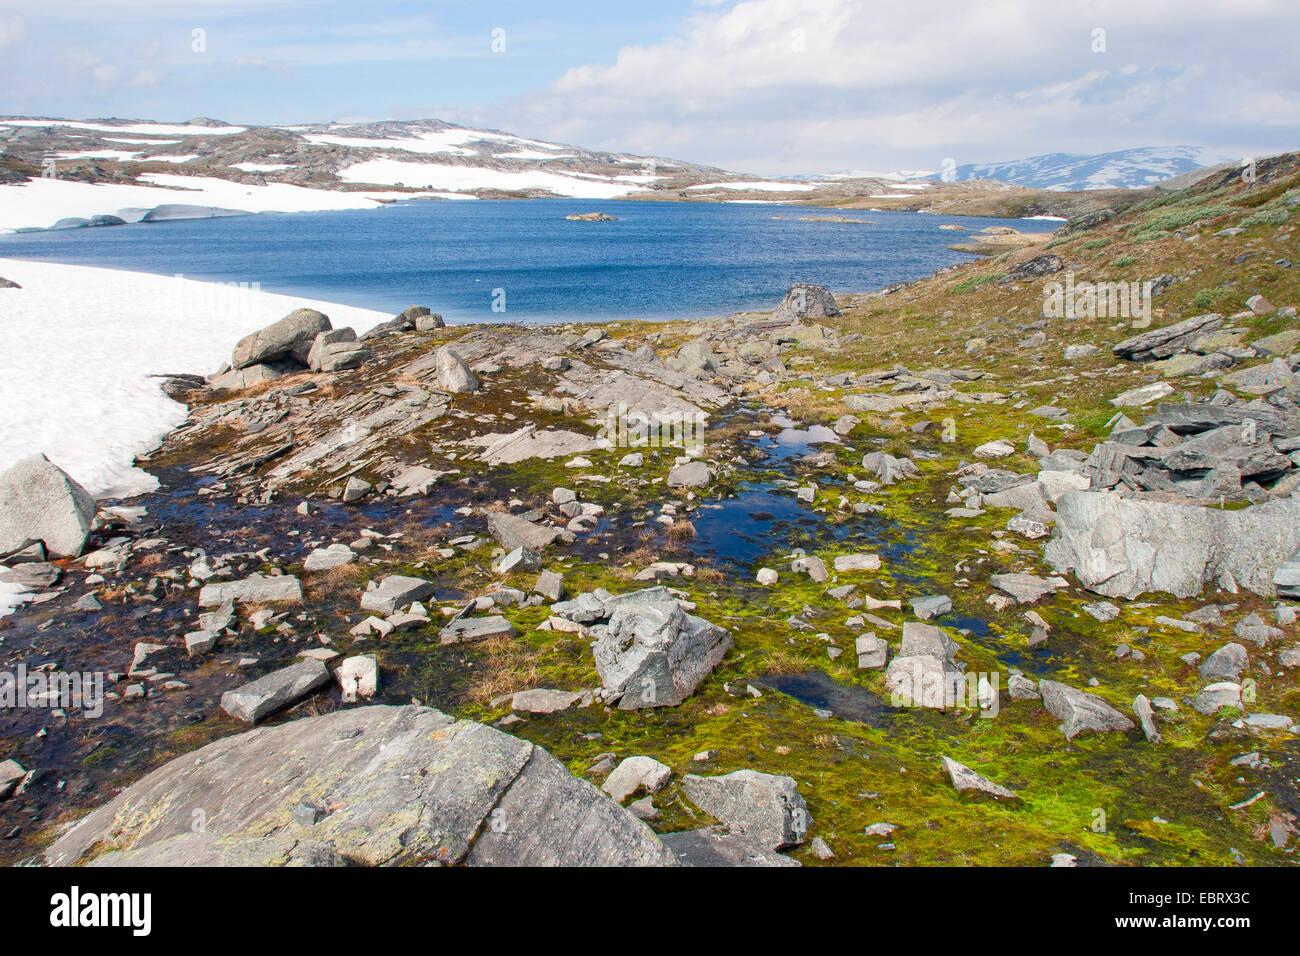 landscape at the Jotunheimen National Park, Norway, Jotunheimen National Park - Stock Image